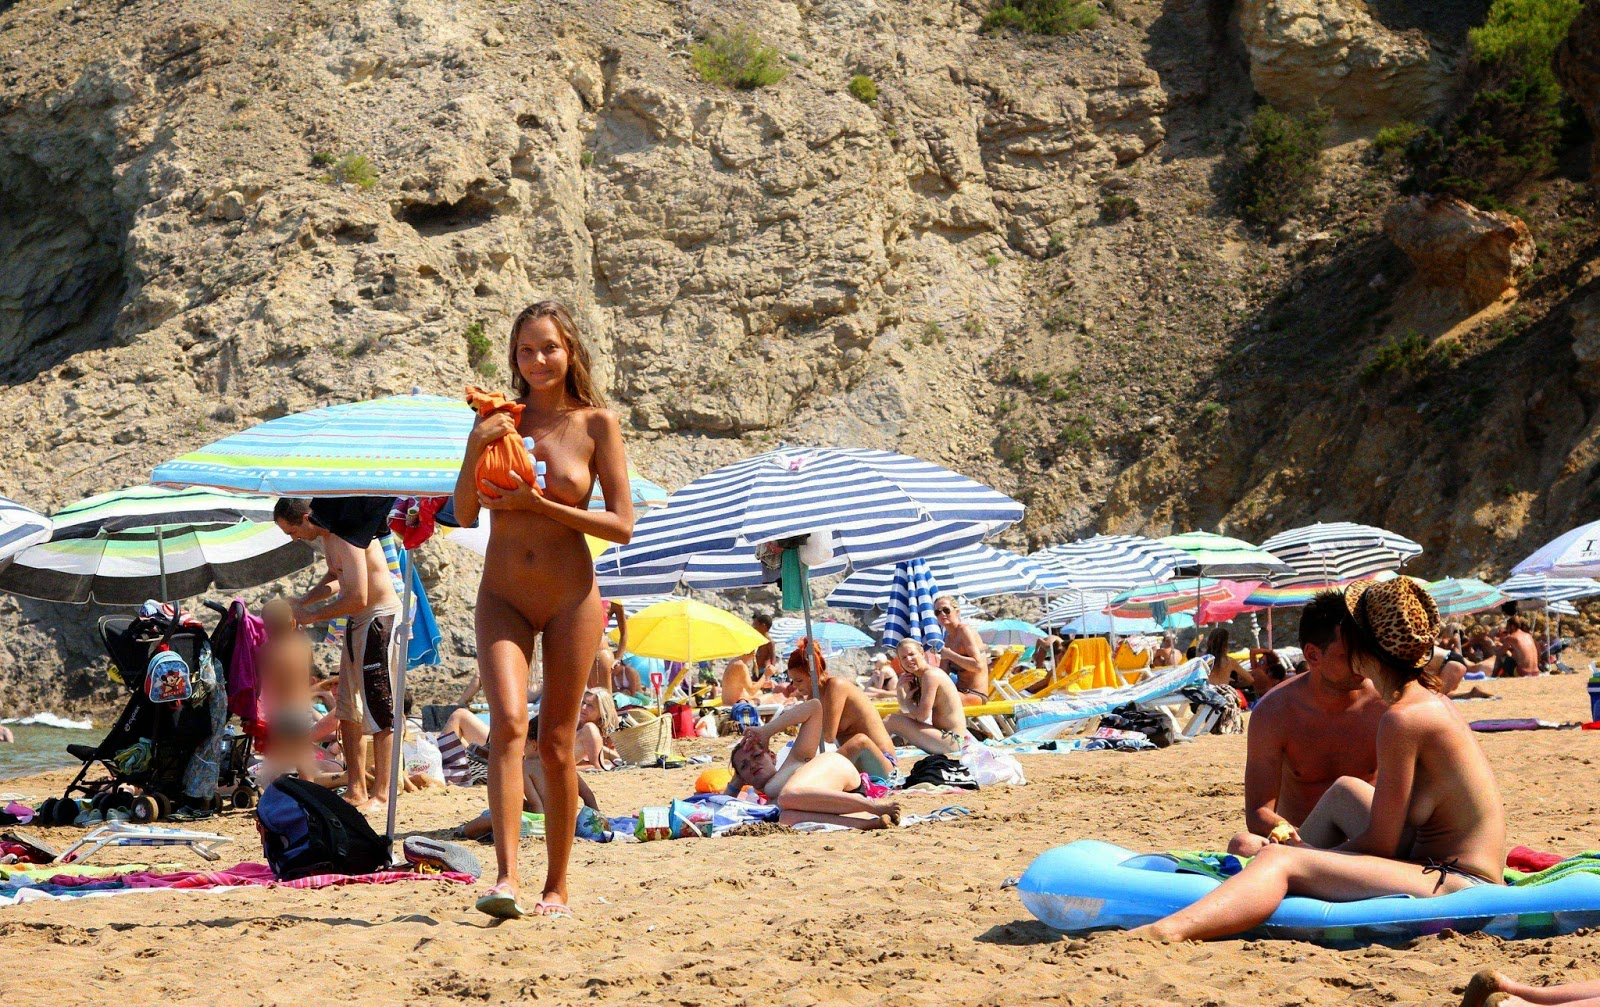 Sexy Nude Beach Teens